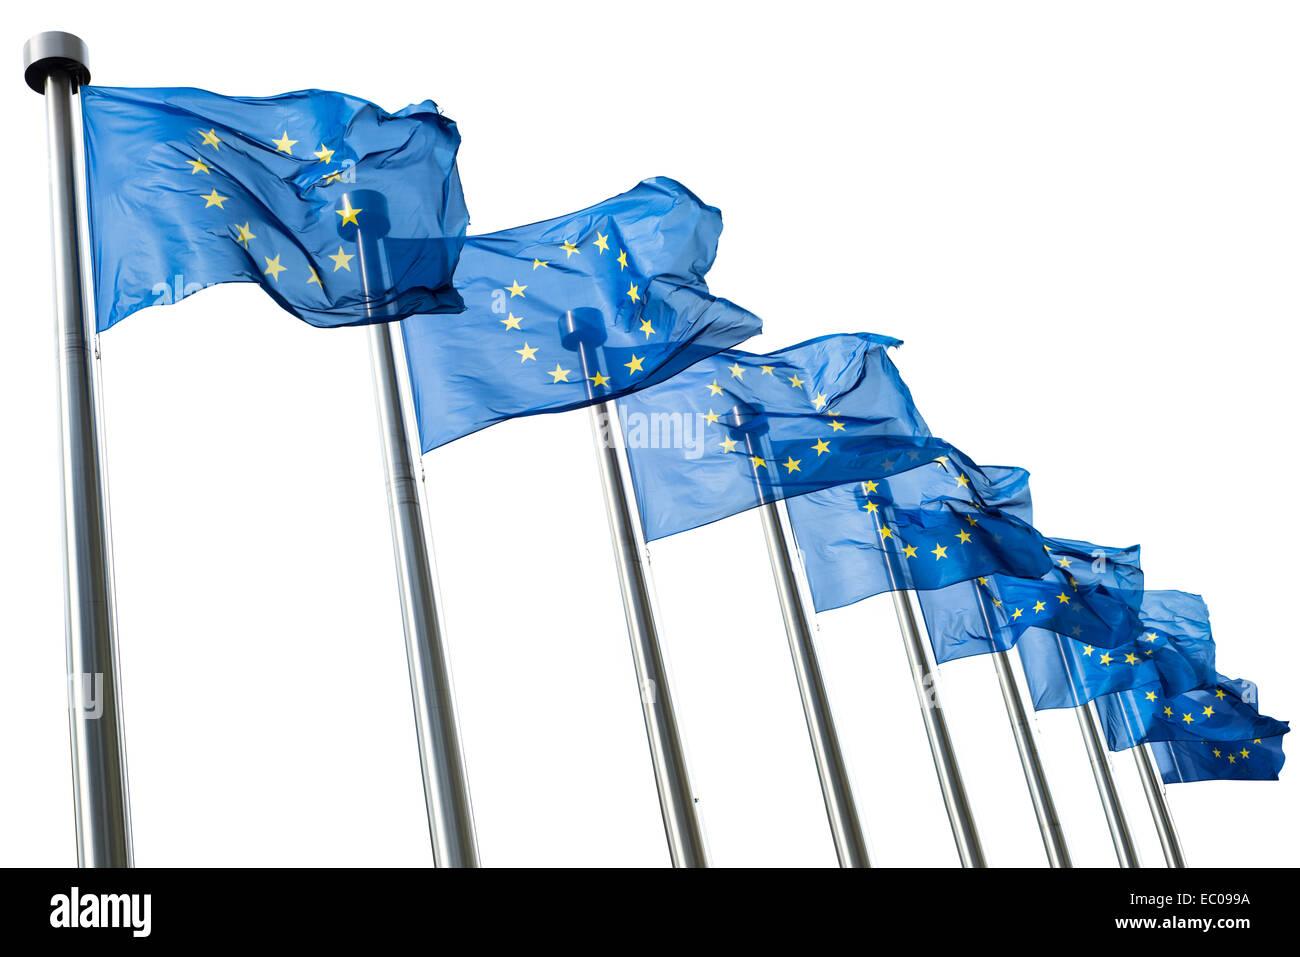 European Union flags isolated on white background - Stock Image